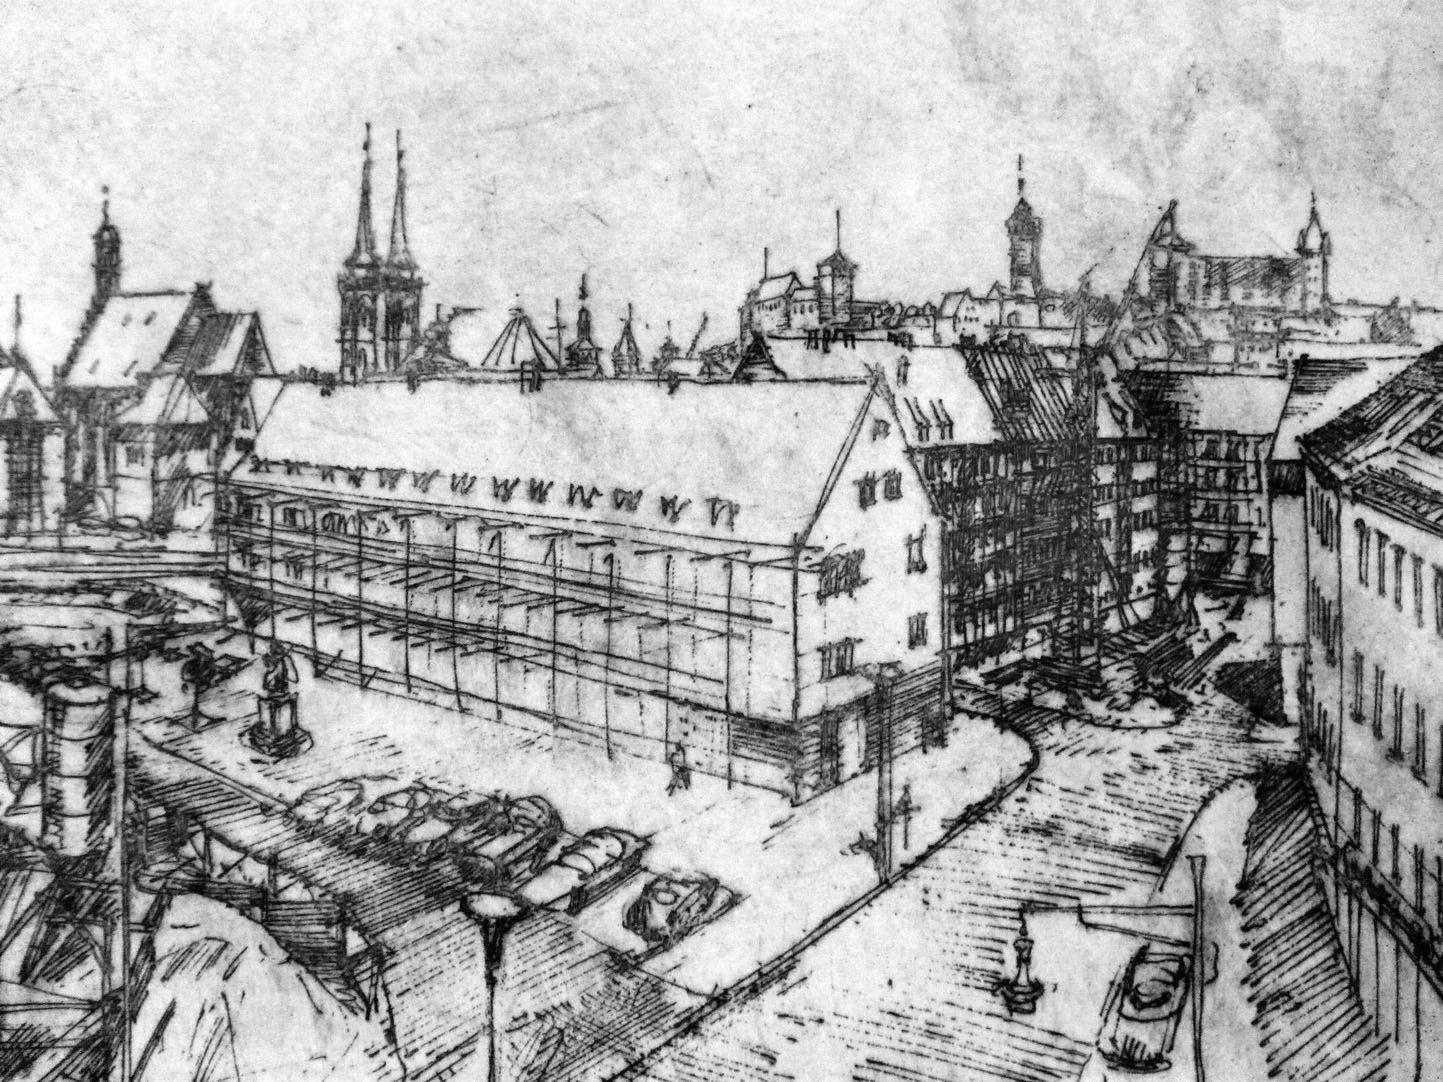 Neubau am Heilig-Geist-Spital rechtes Bilddrittel